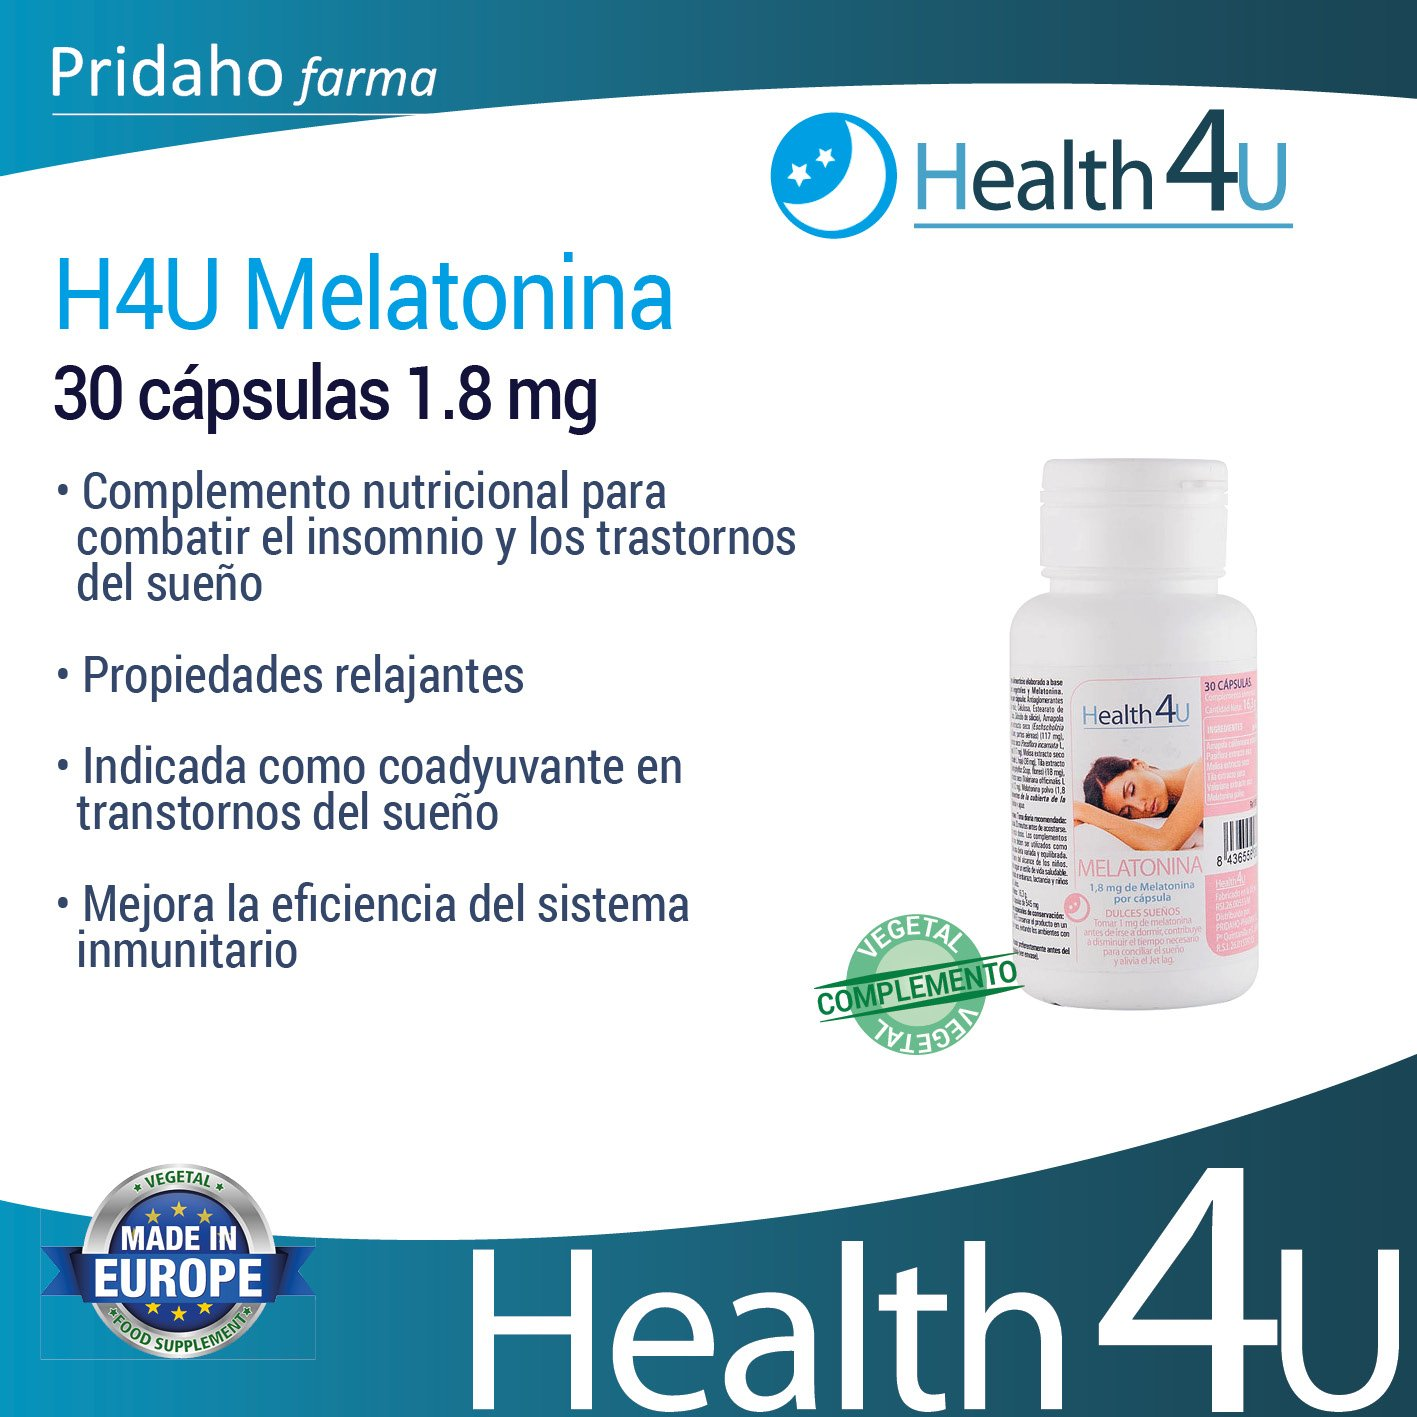 H4U - H4U Melatonina 30 cápsulas 1.8 mg